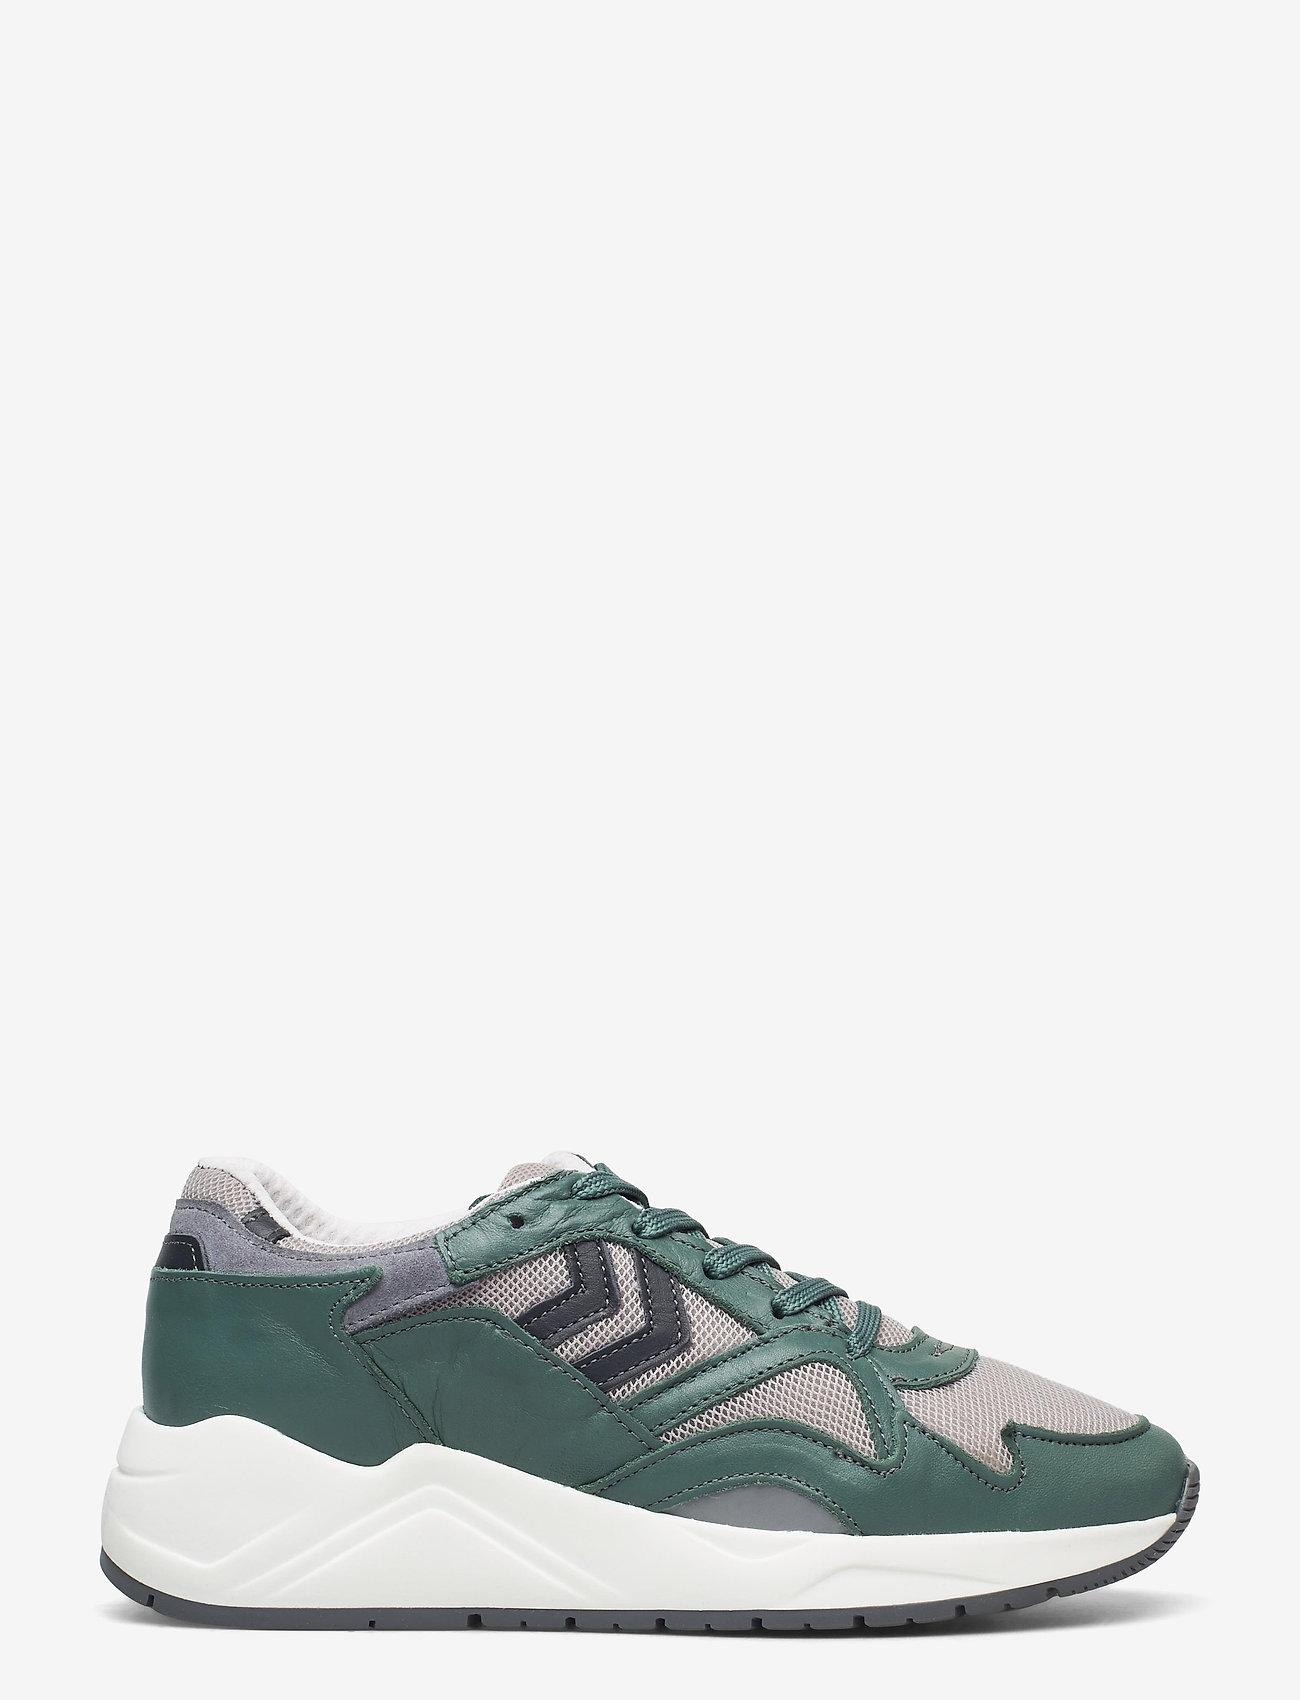 Hummel - EDMONTON HIVE - laag sneakers - dusty olive - 0